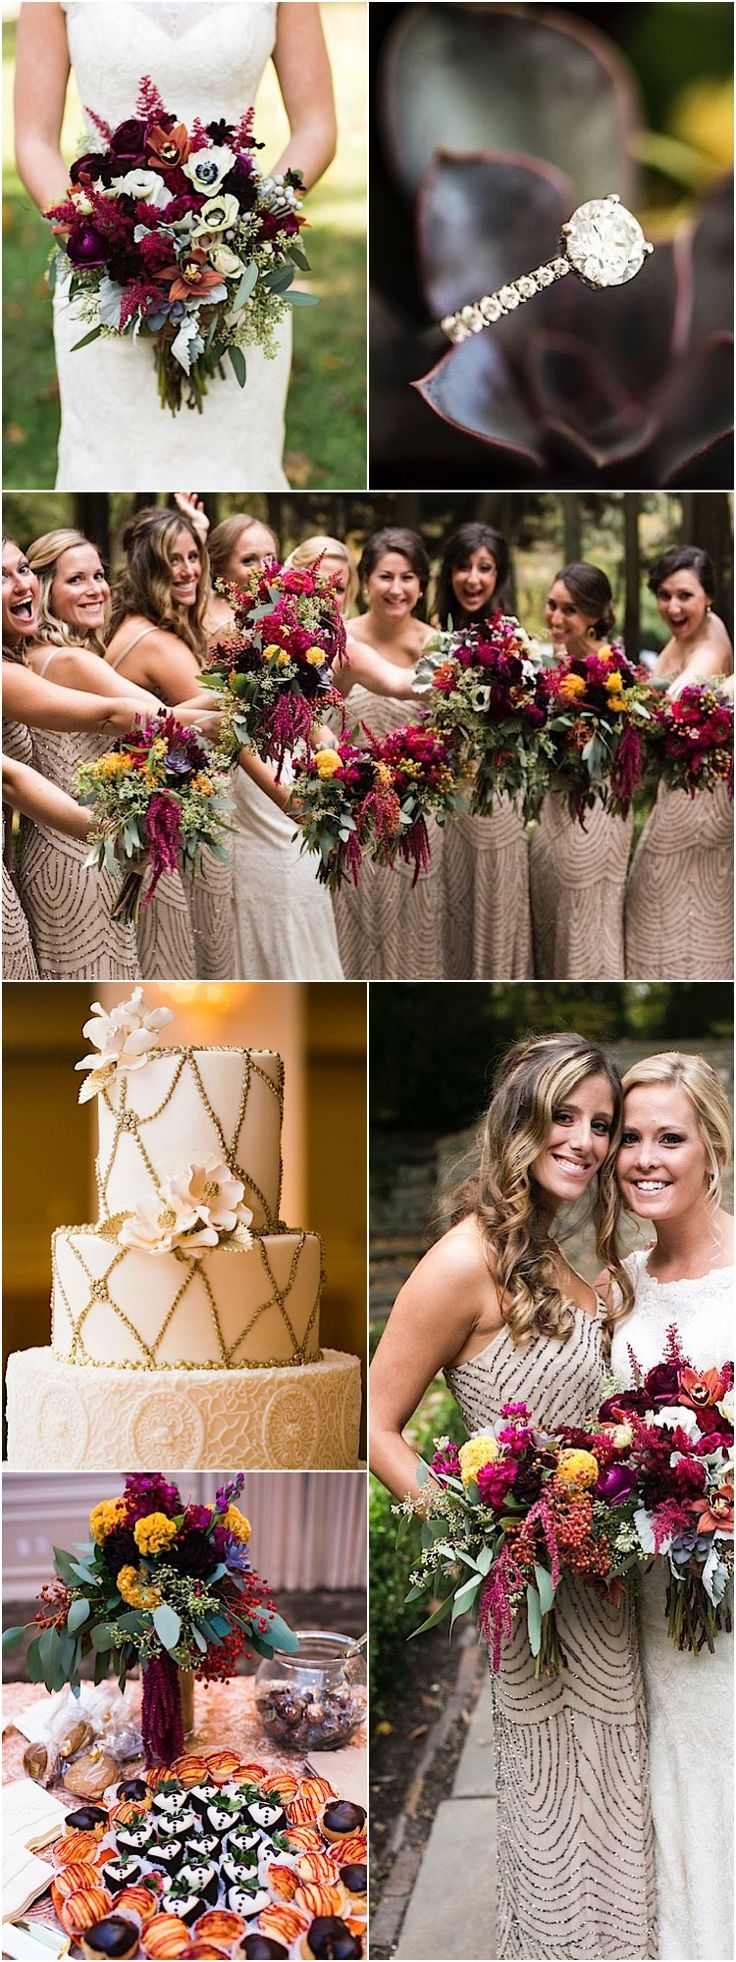 Gorgeous Fall wedding reception idea; photo: Carley K Photography